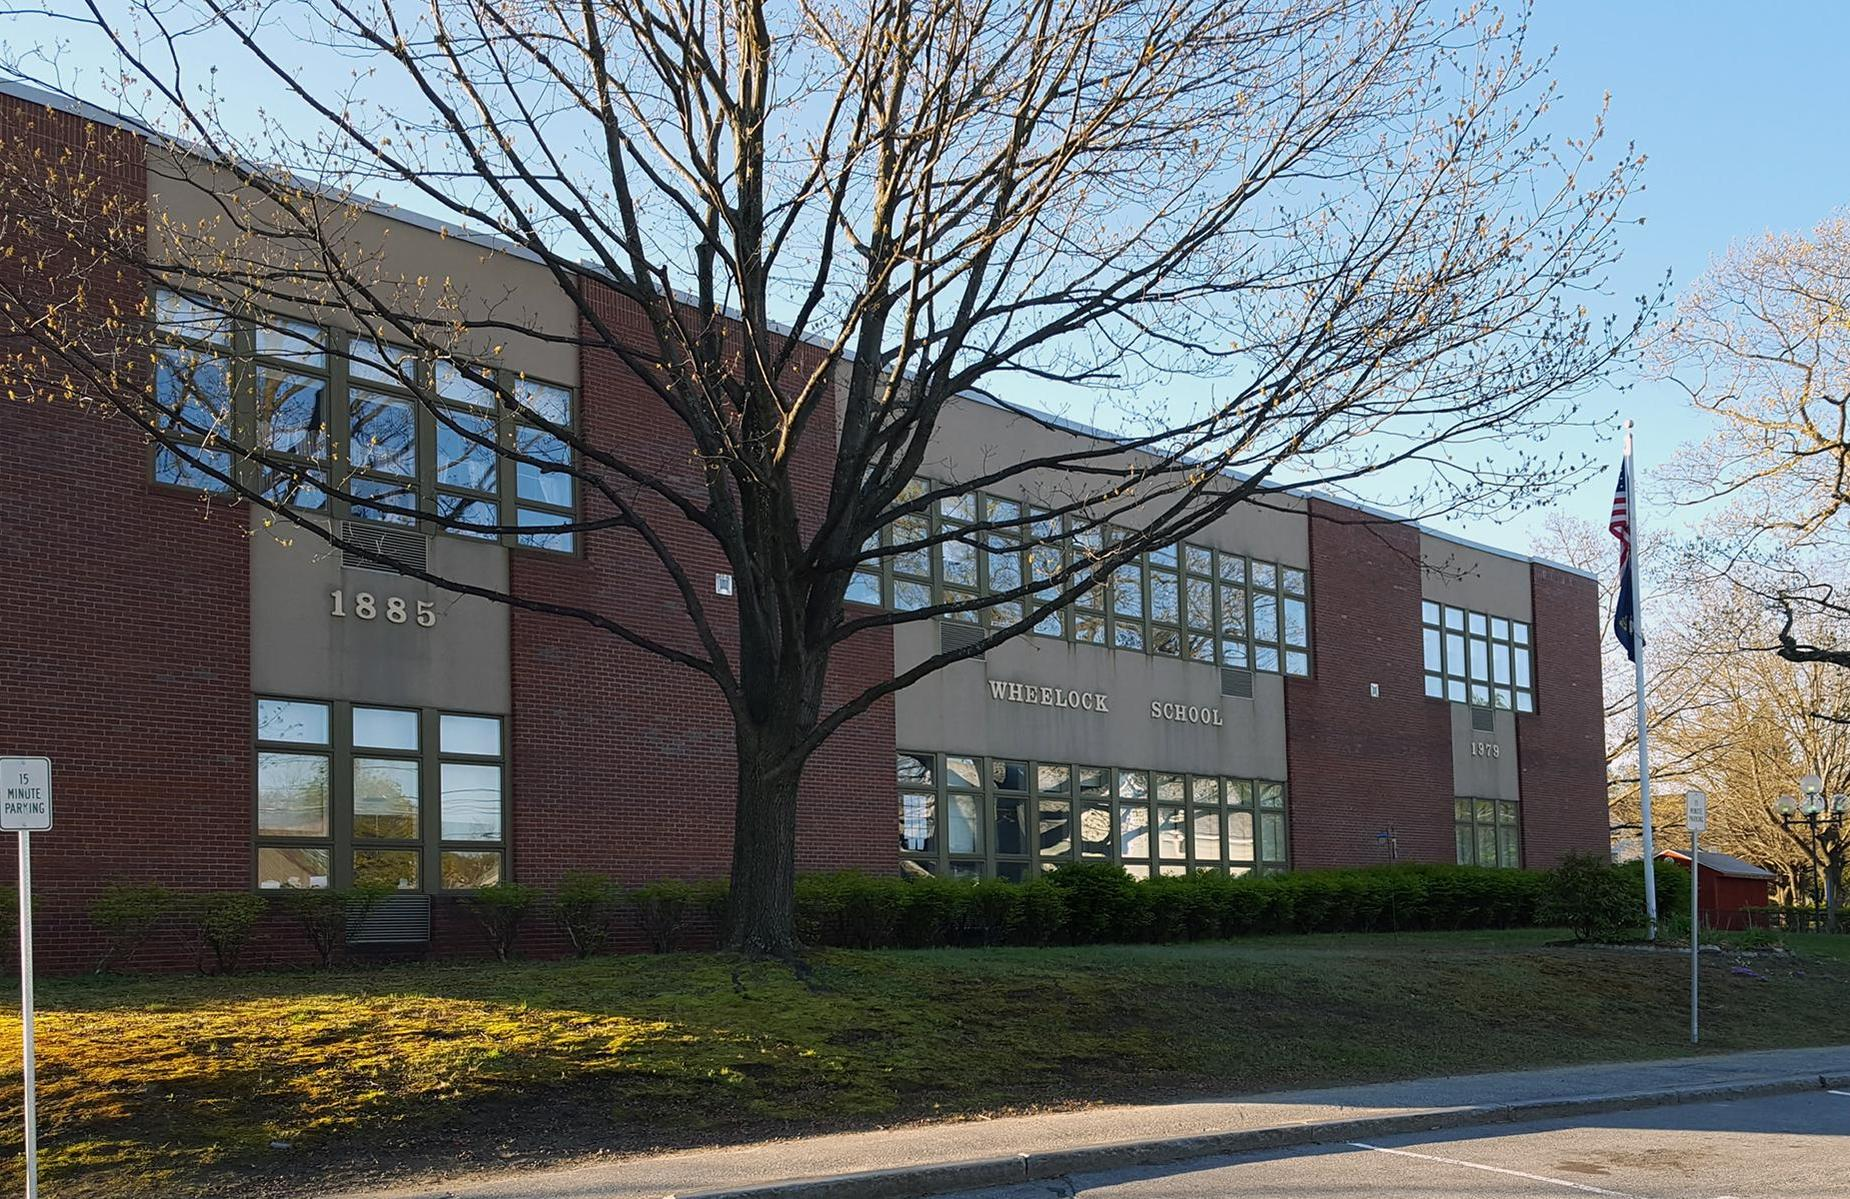 Wheelock School